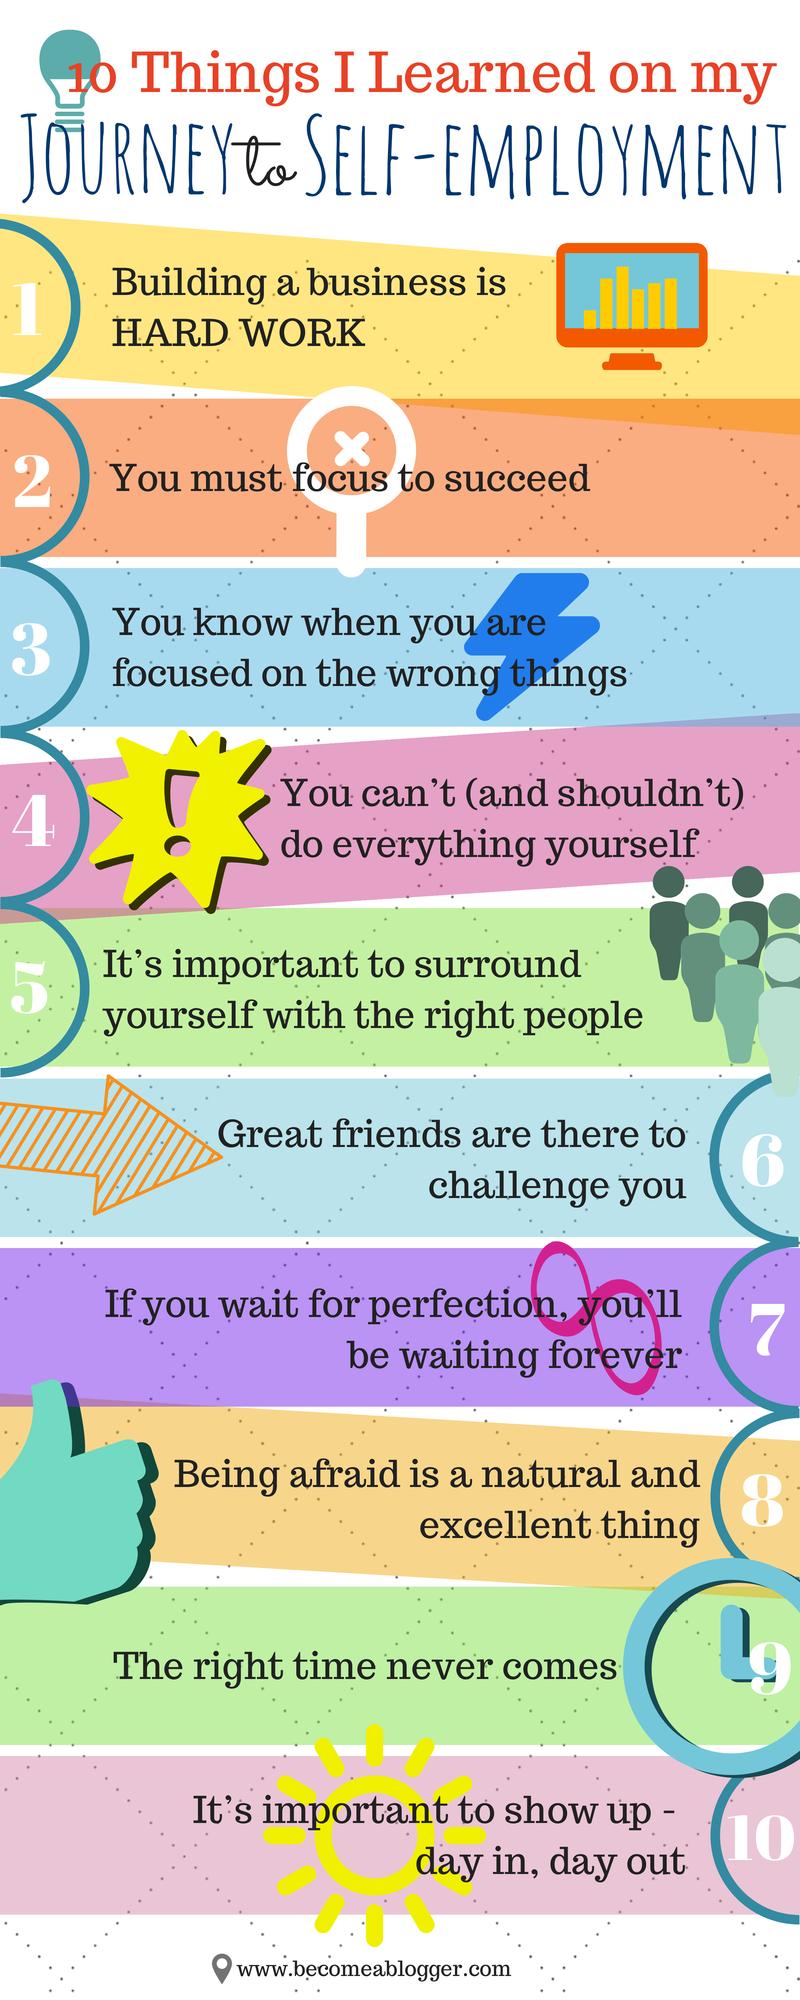 06_30_Self_Employment_infographic